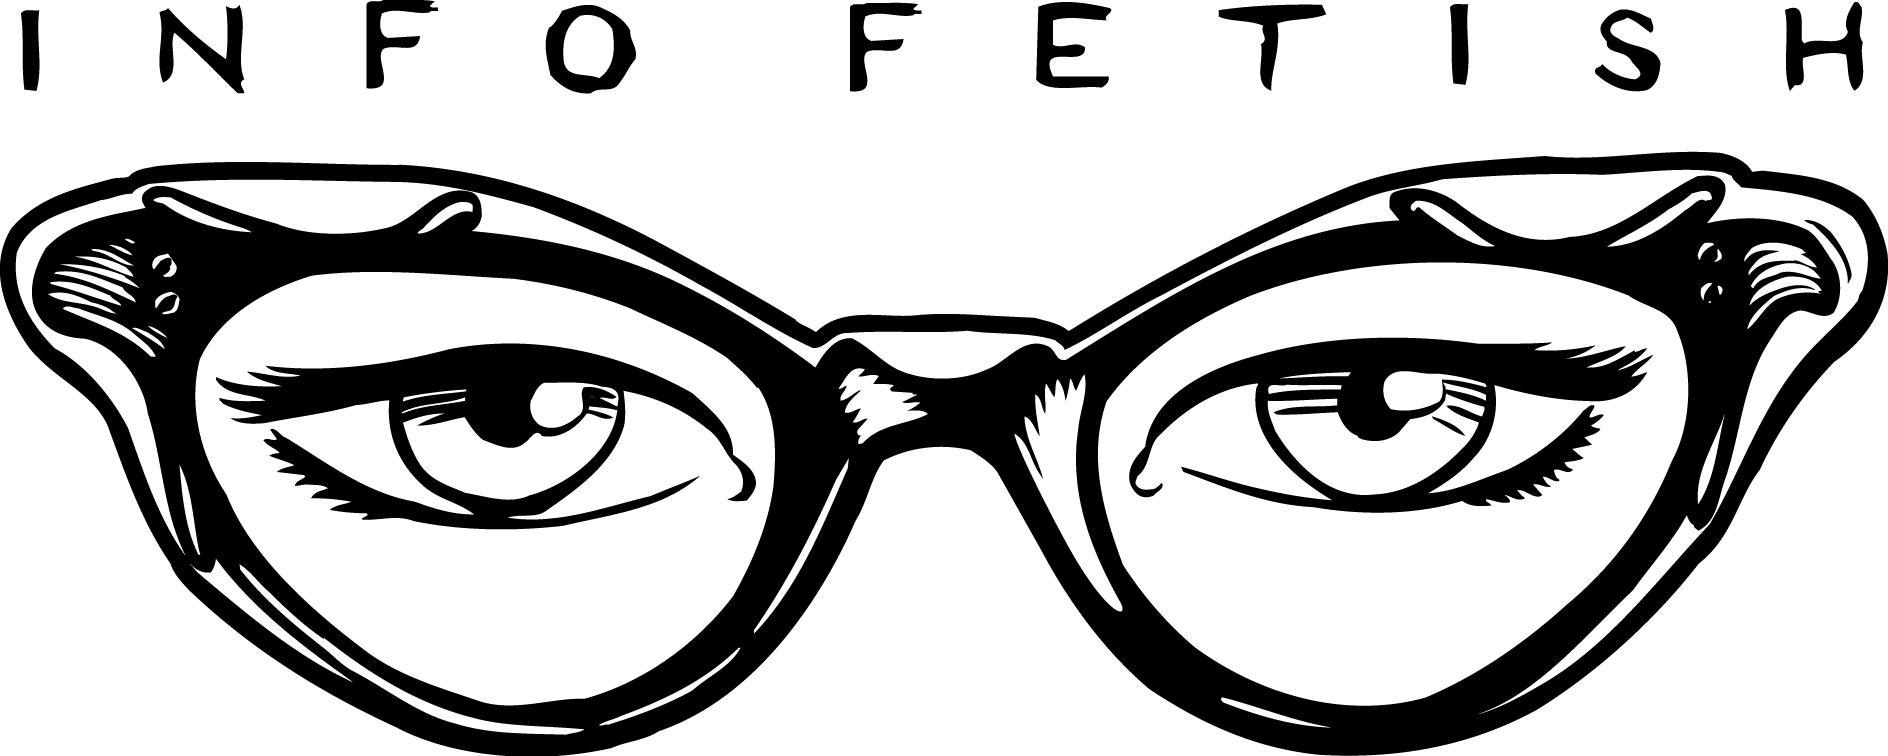 Infofetish logo b&w revised blacks.jpg